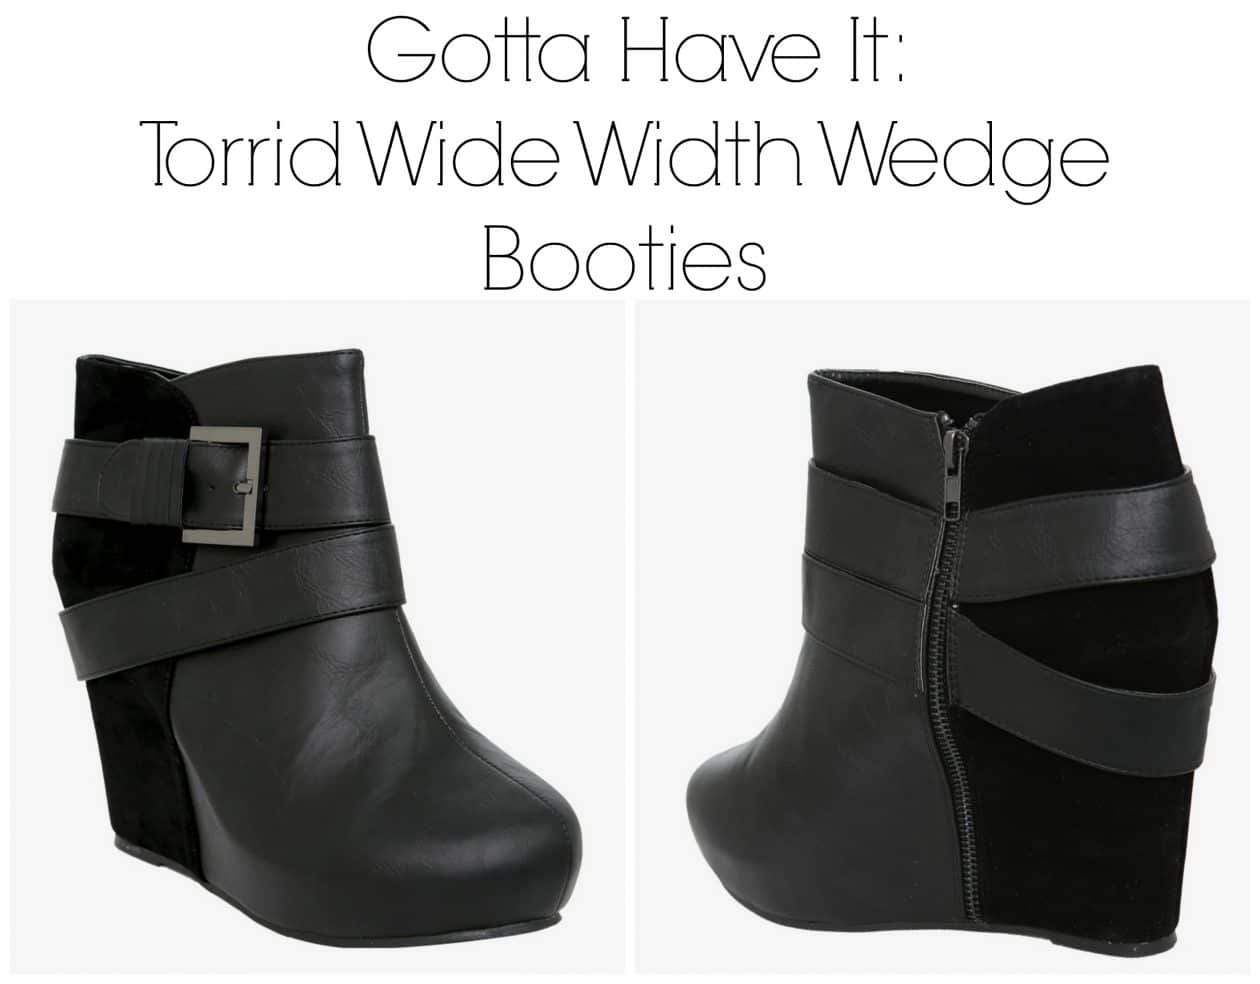 Gotta Have It: These Torrid Wide Width Booties